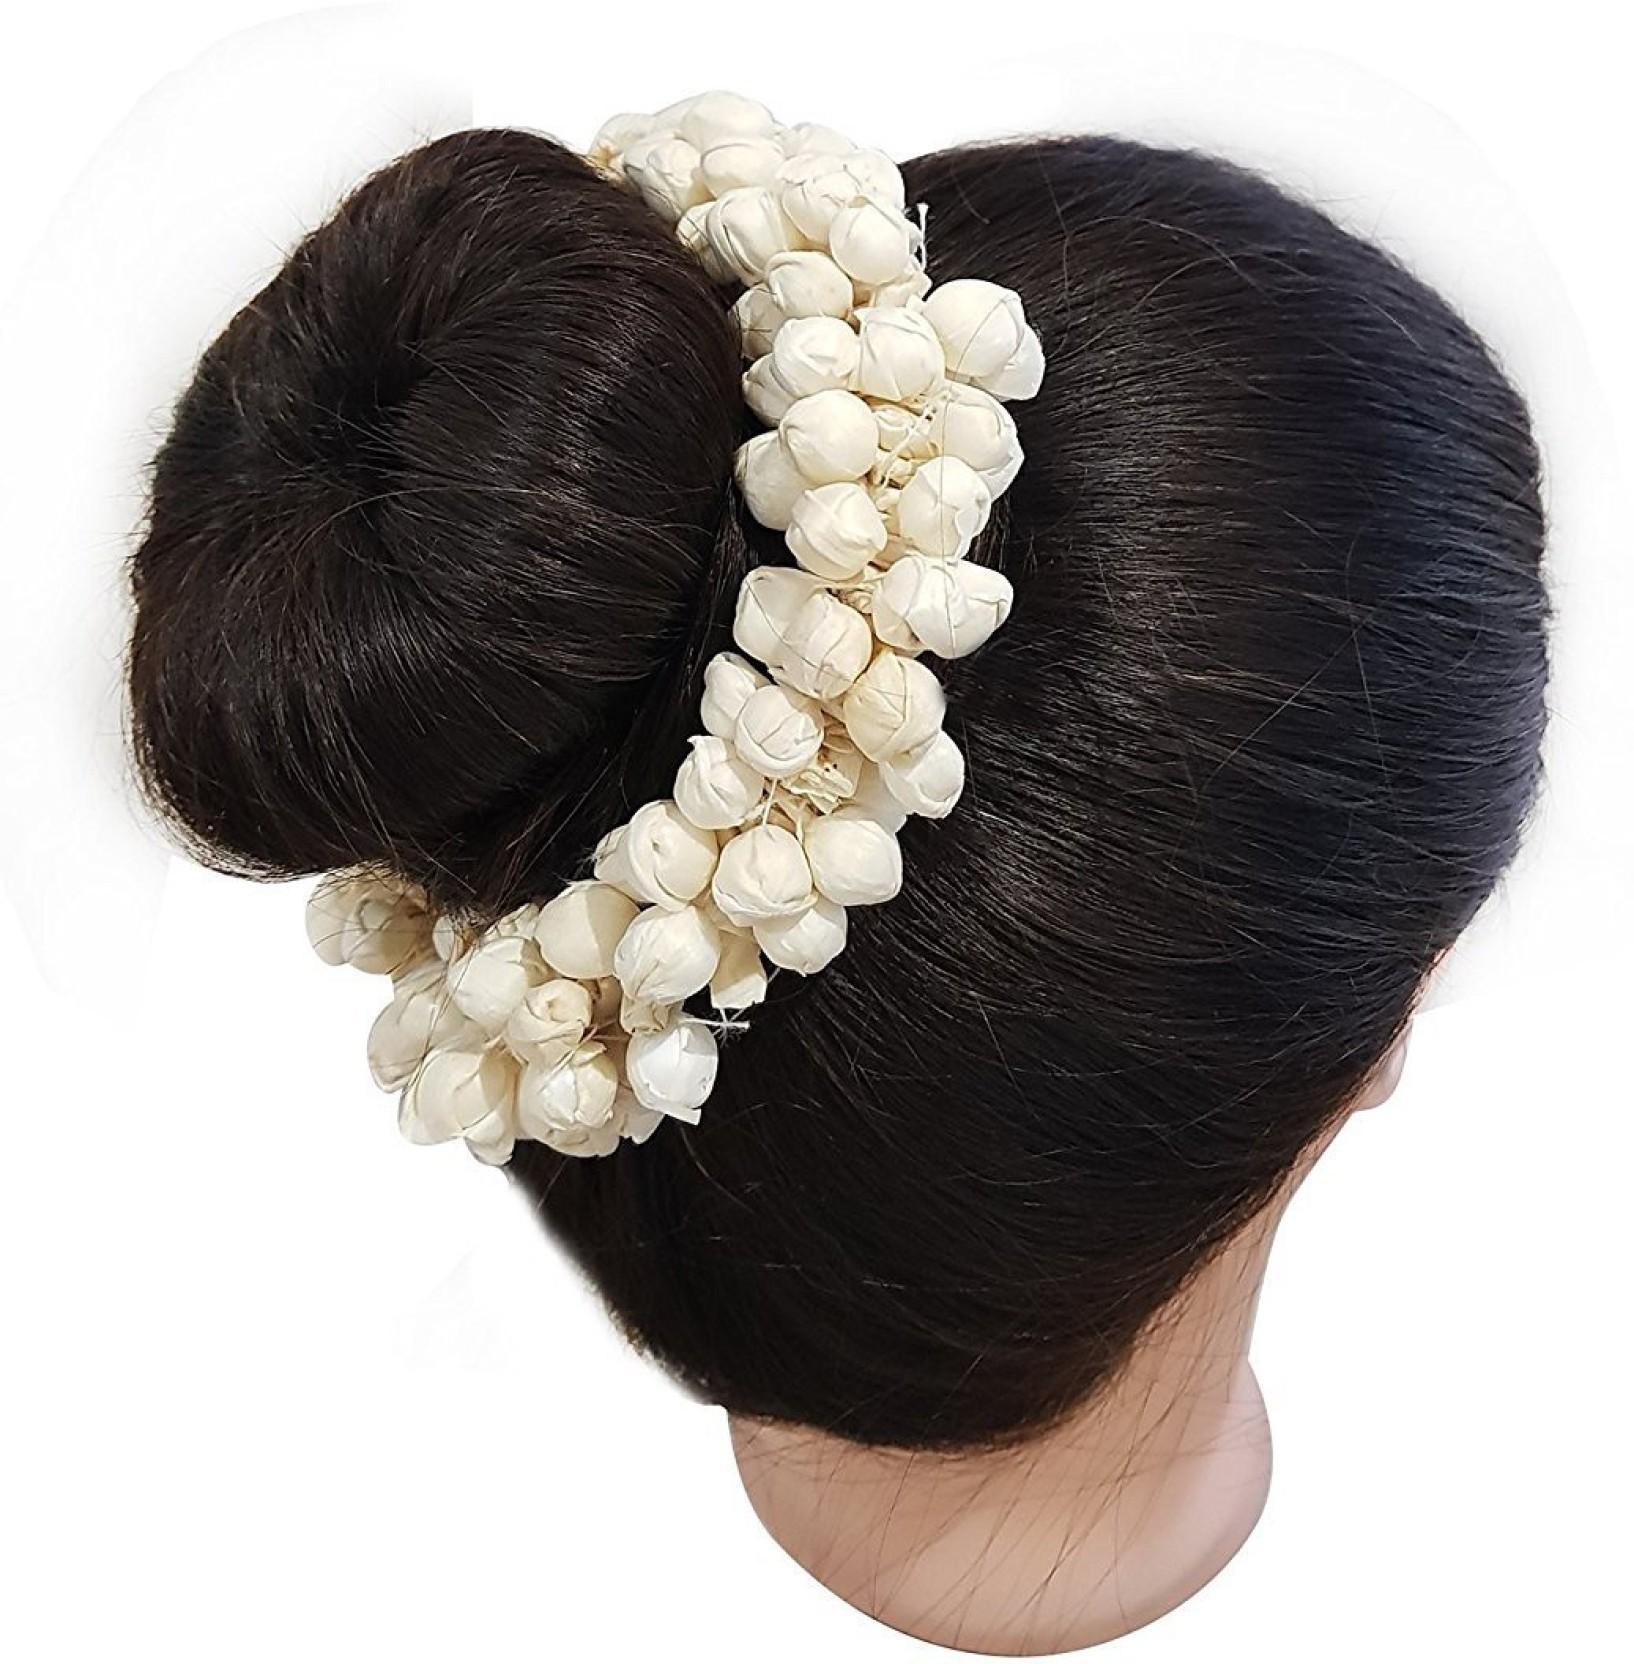 raaya hair accessories gajra flowers | gajra for hair south